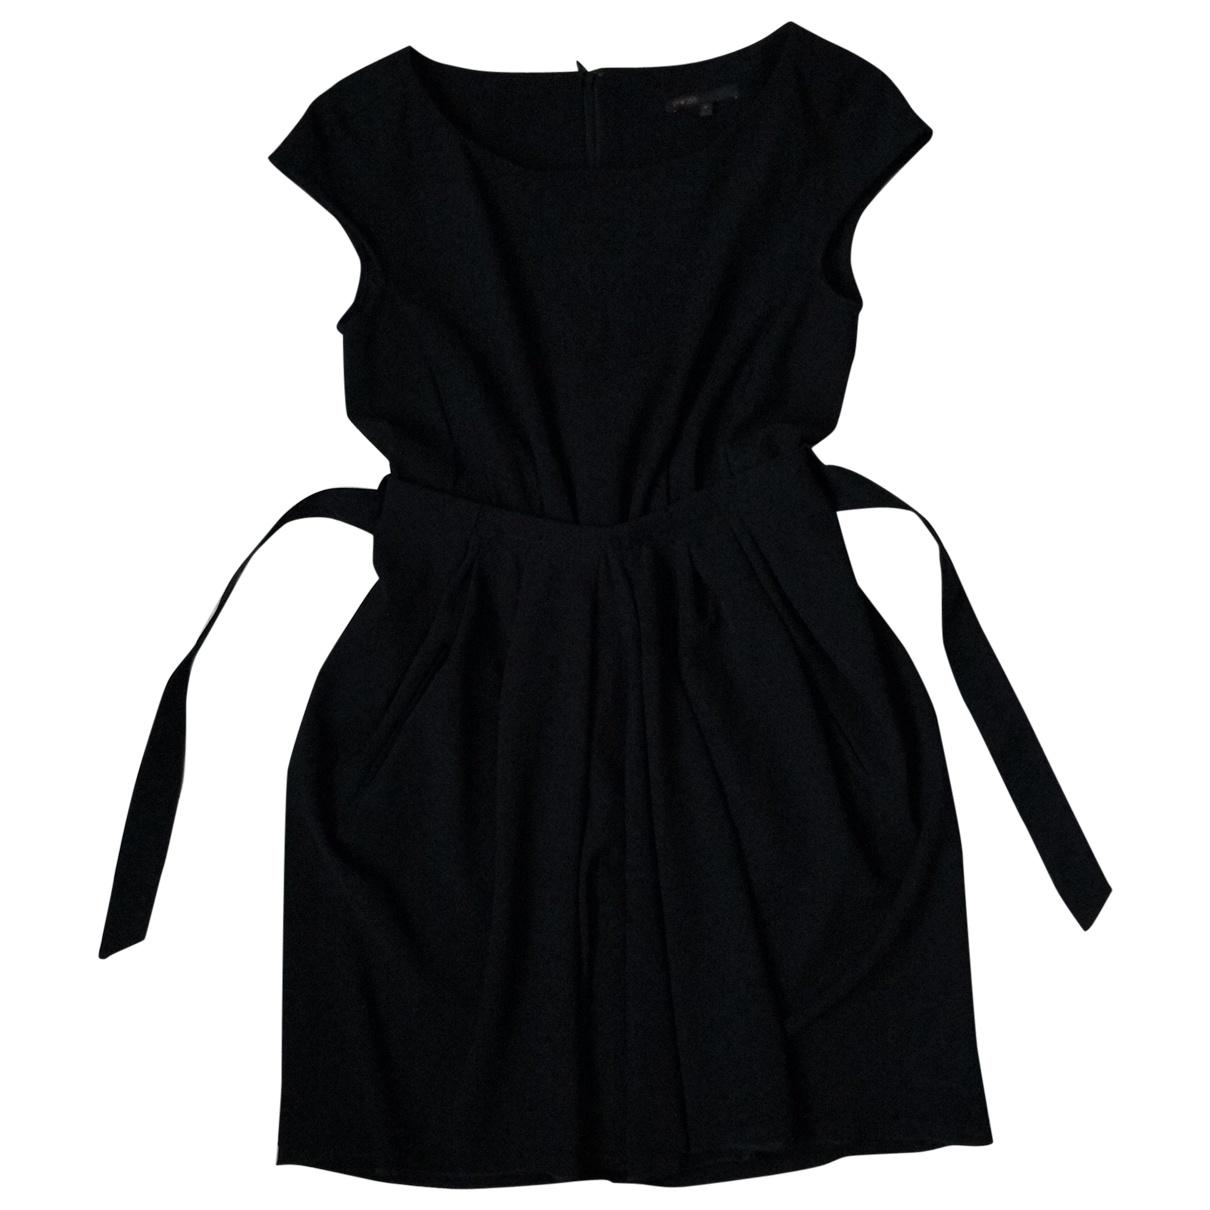 Maje \N Black dress for Women 1 0-5